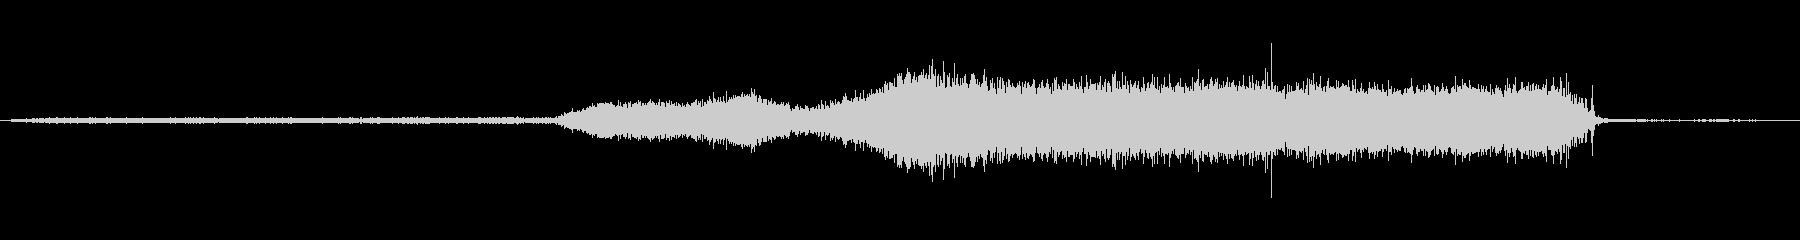 EXT:右からのリバースメディ、ス...の未再生の波形